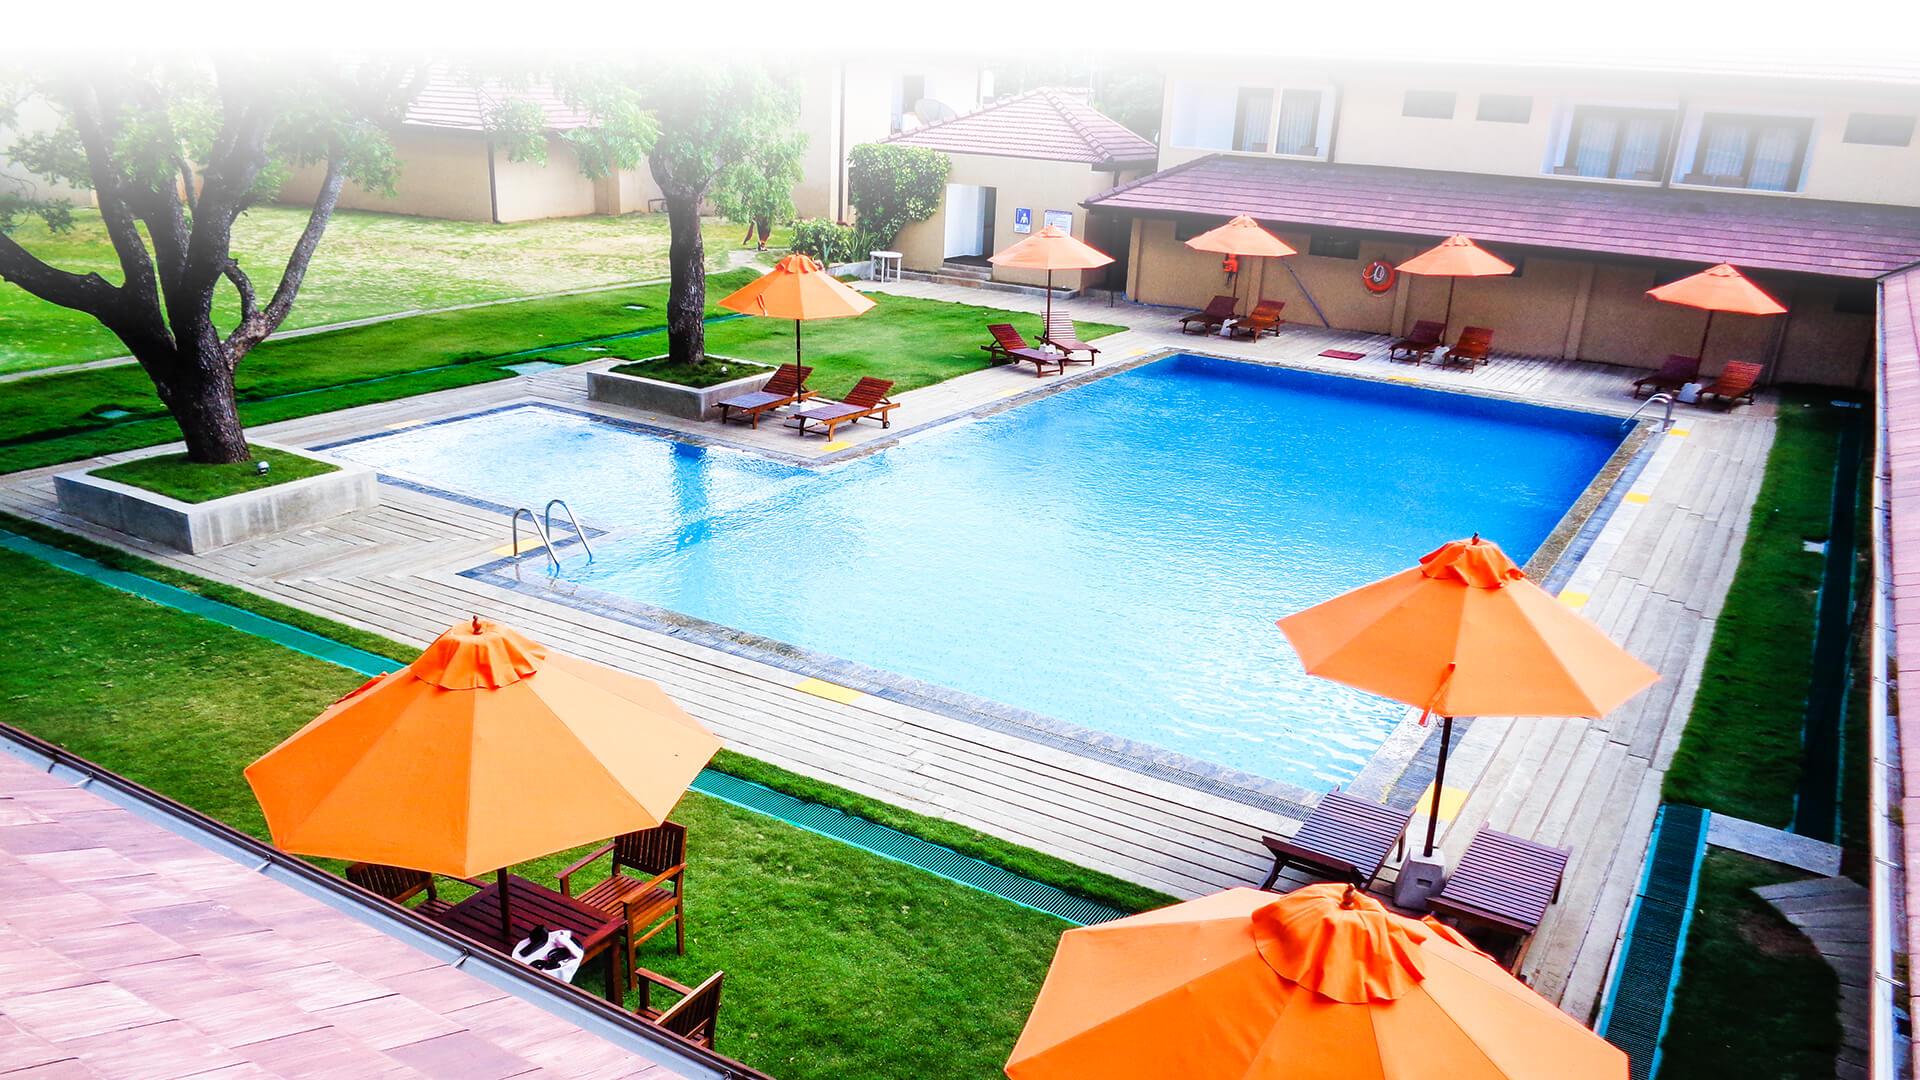 The Best Modern Luxury Hotel In Anuradhapura, Sri Lanka